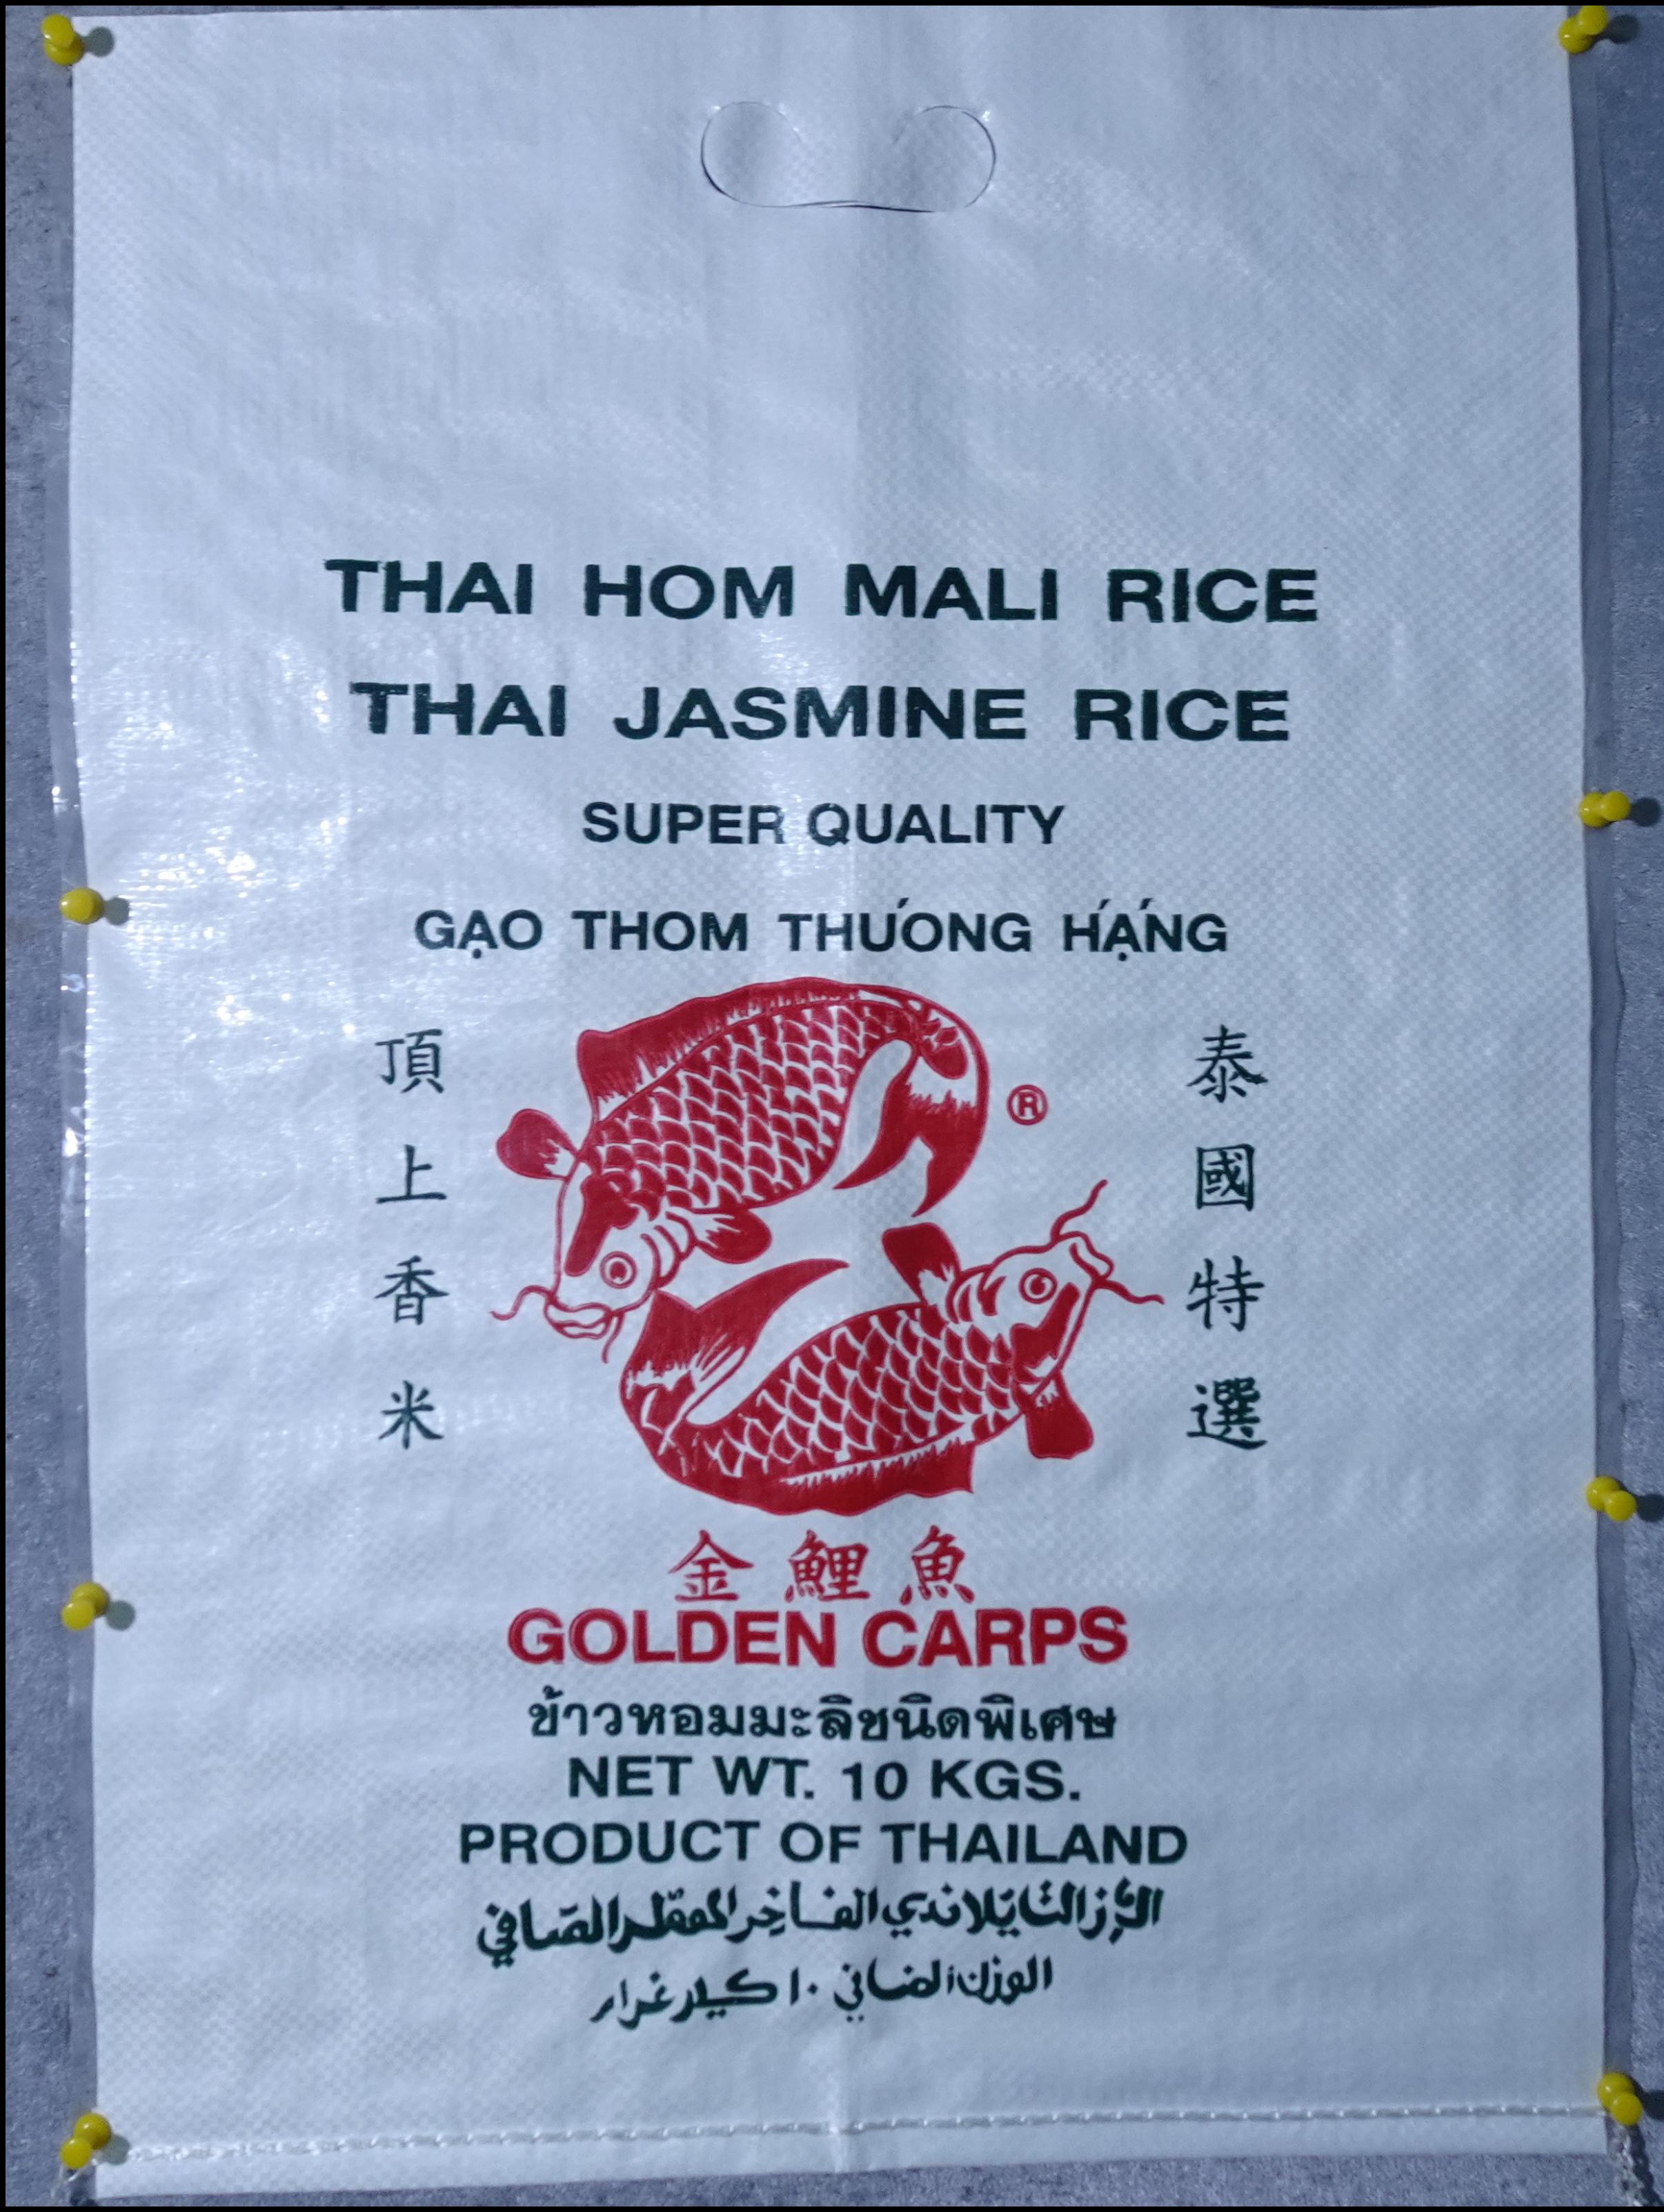 THAI RICE (THANYA RICE THAILAND)